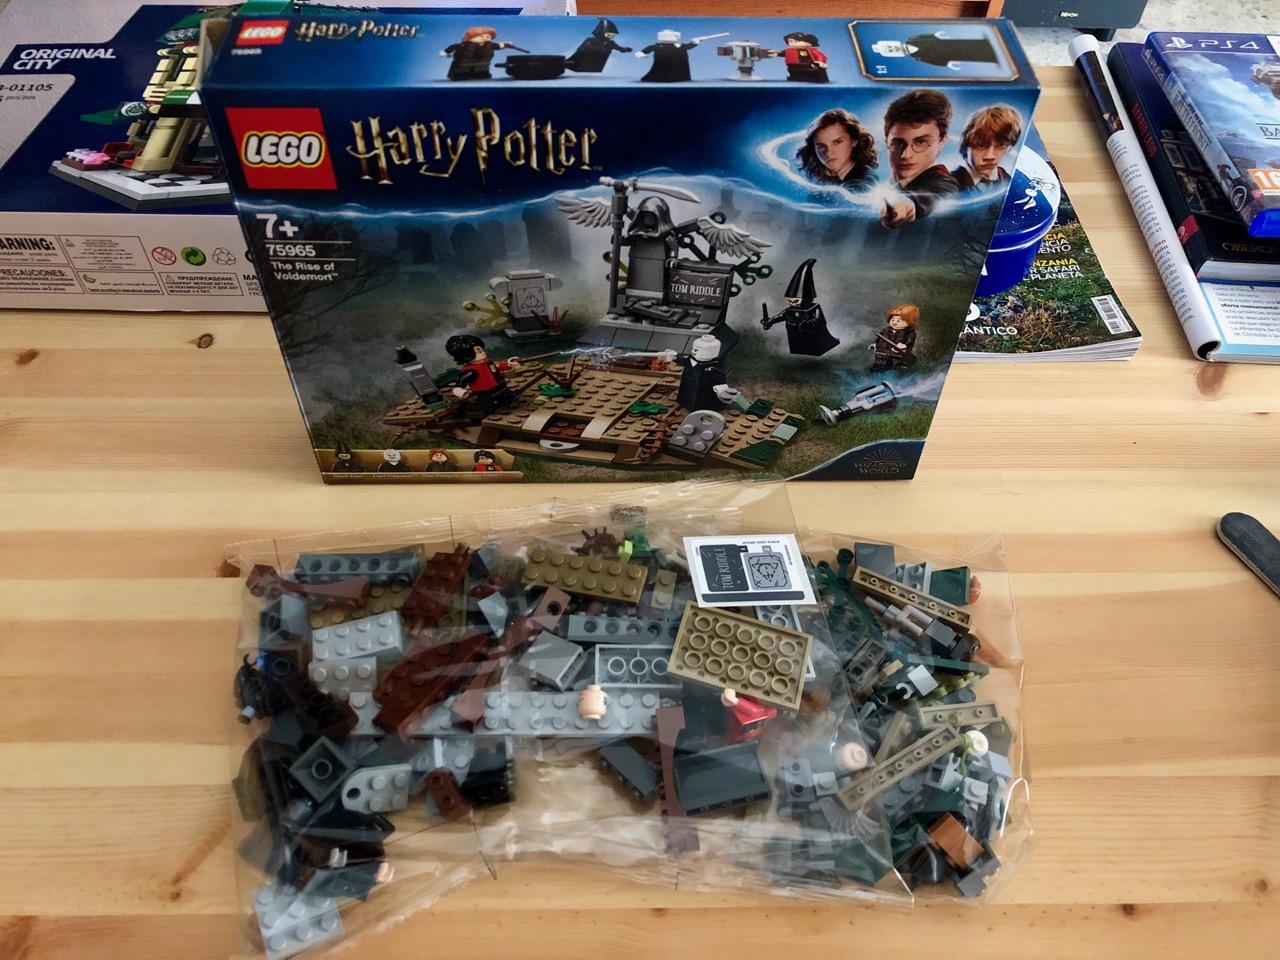 Lego Alzamiento Voldemort 75965 Harry Potter